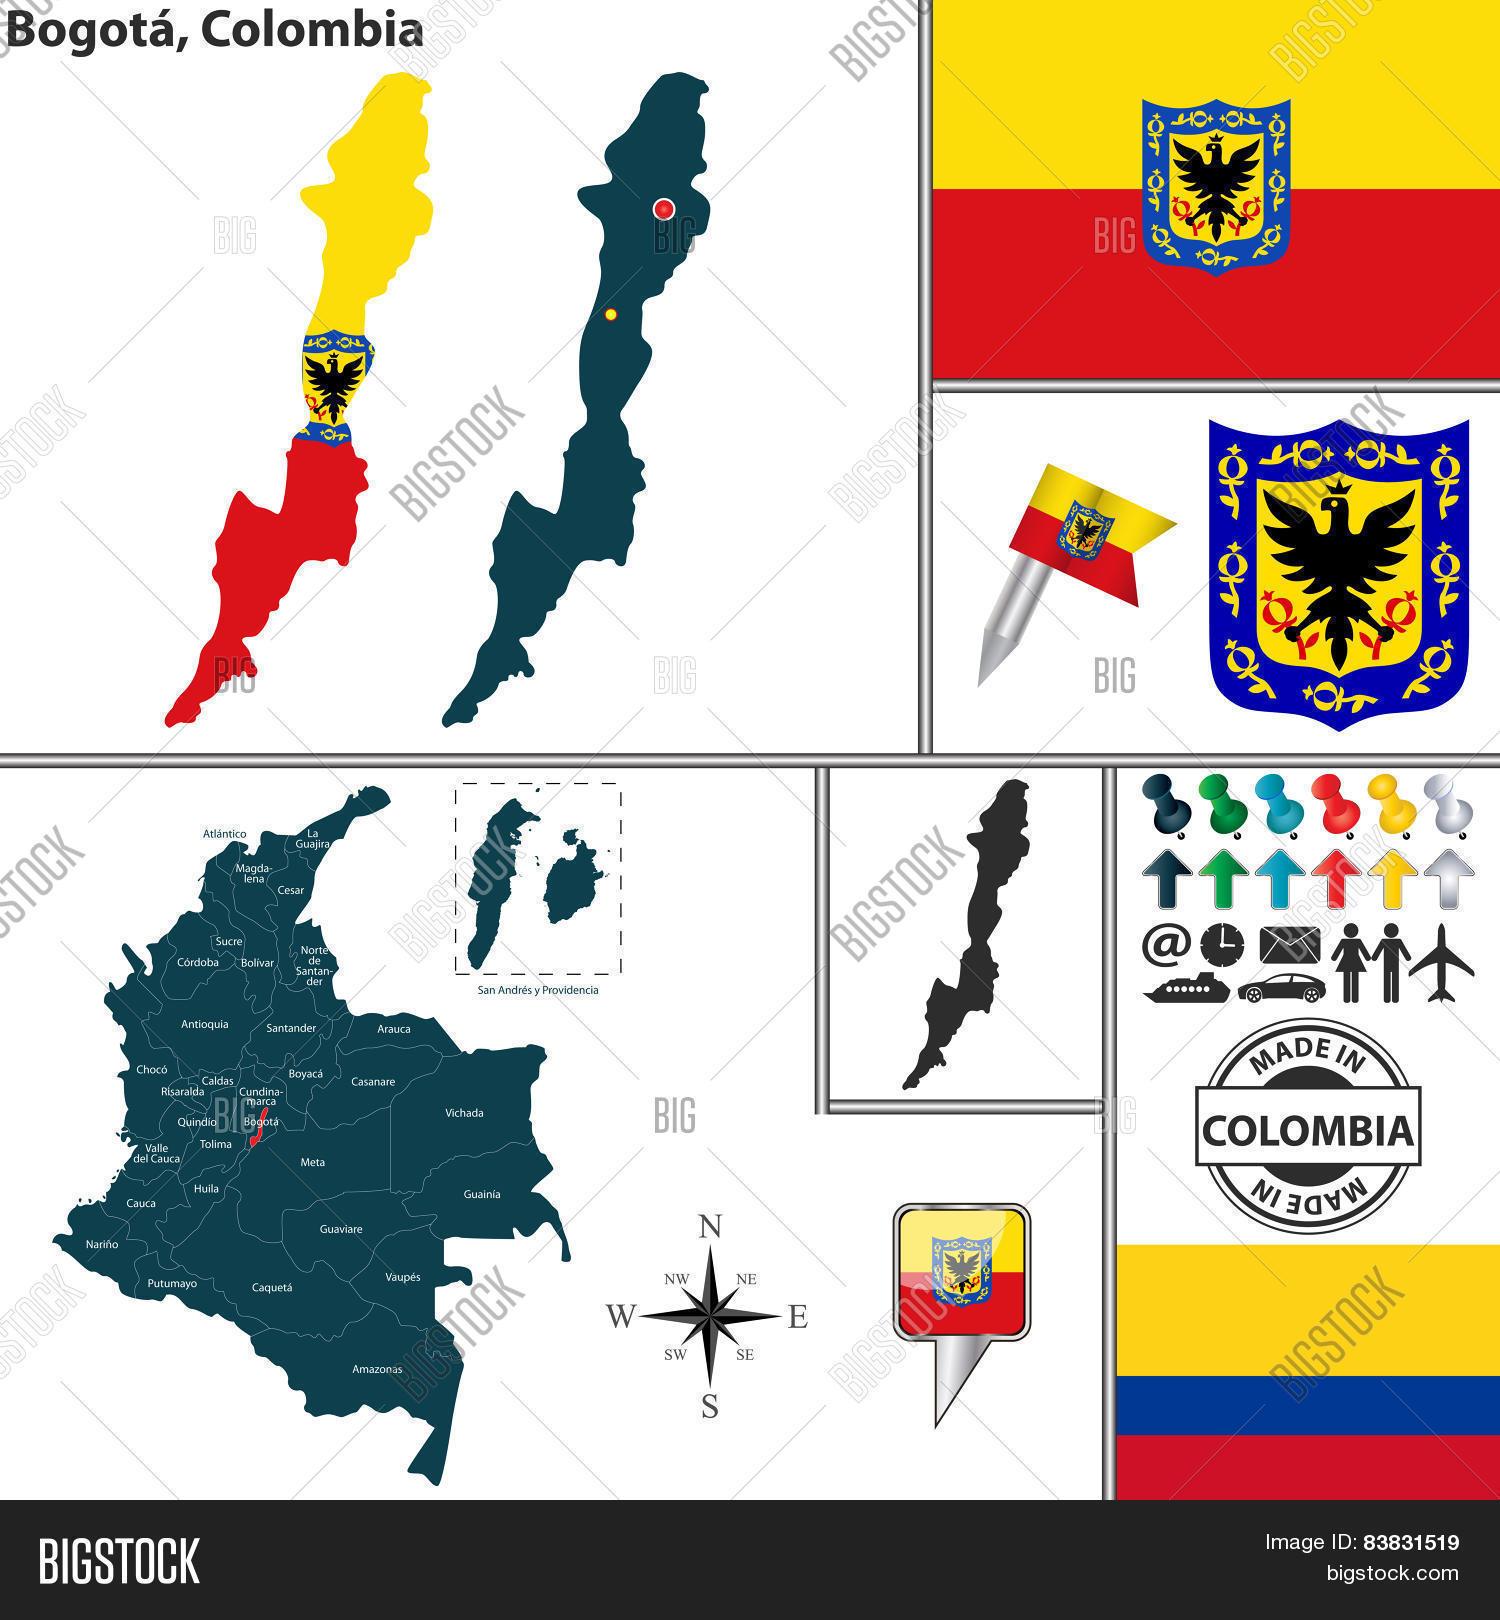 Map Bogota, Colombia Vector & Photo (Free Trial) | Bigstock